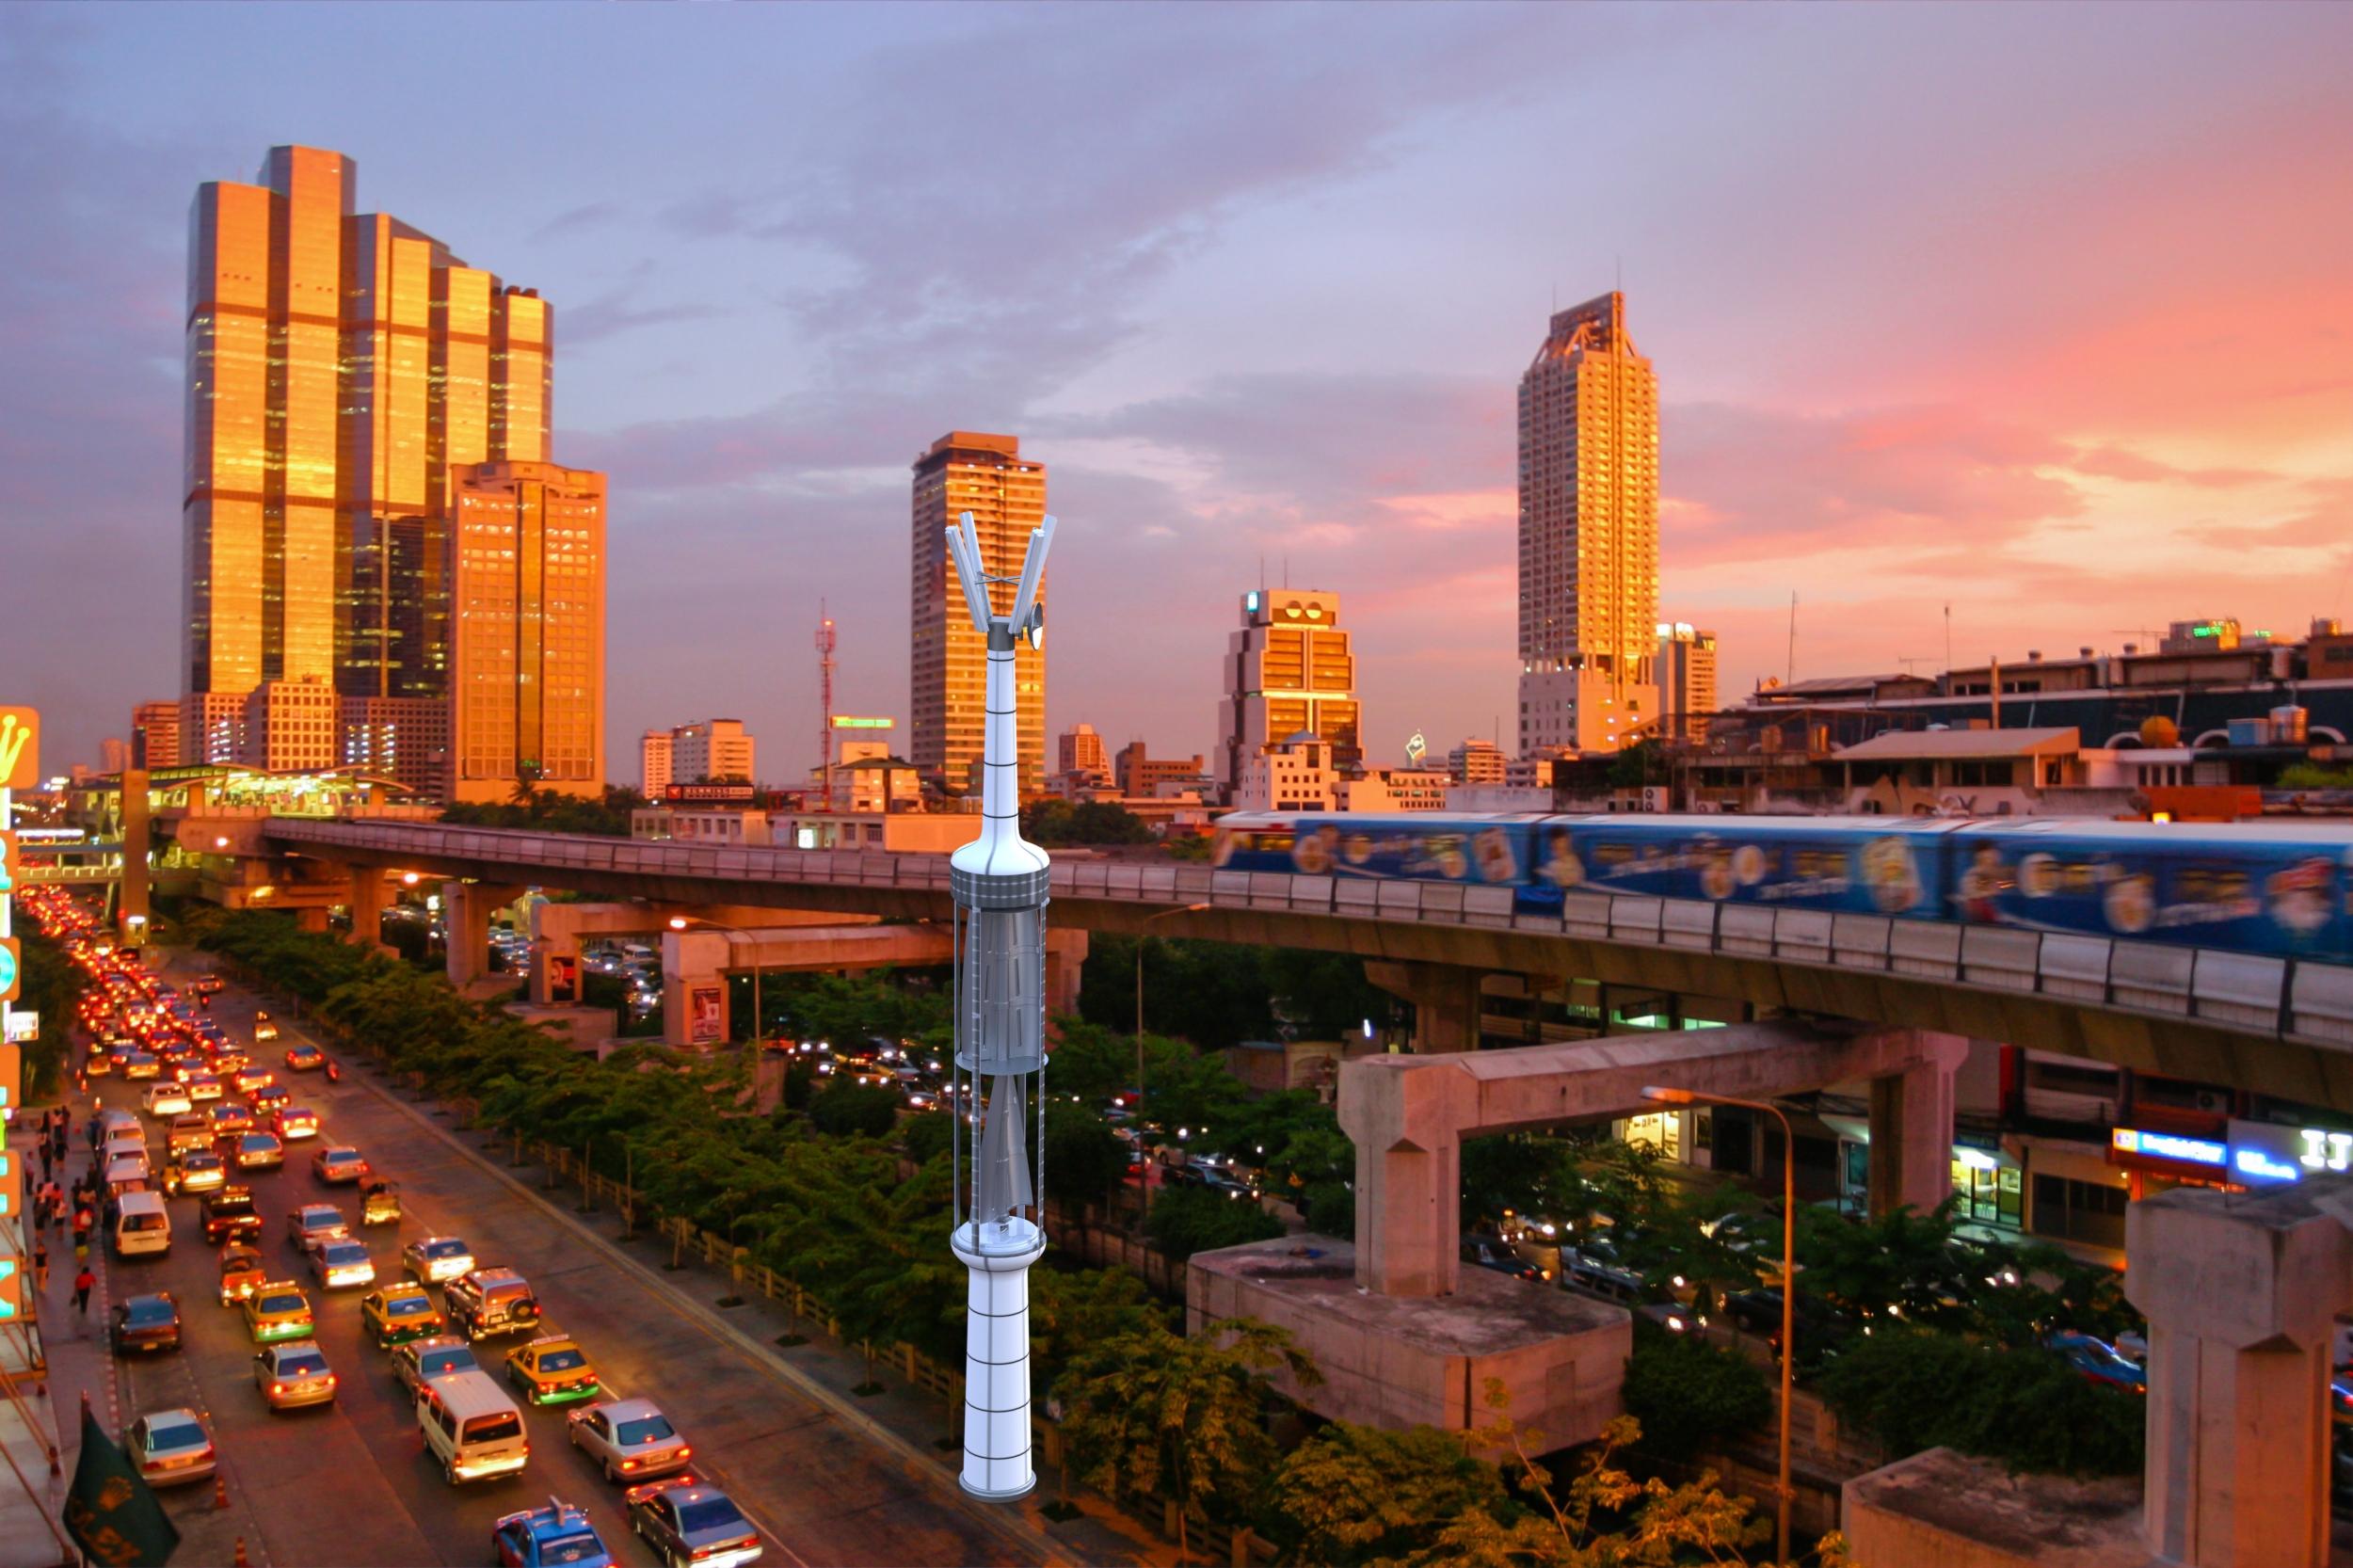 2-Bangkok Aspect ratio 3x2 2500Wmin.JPG